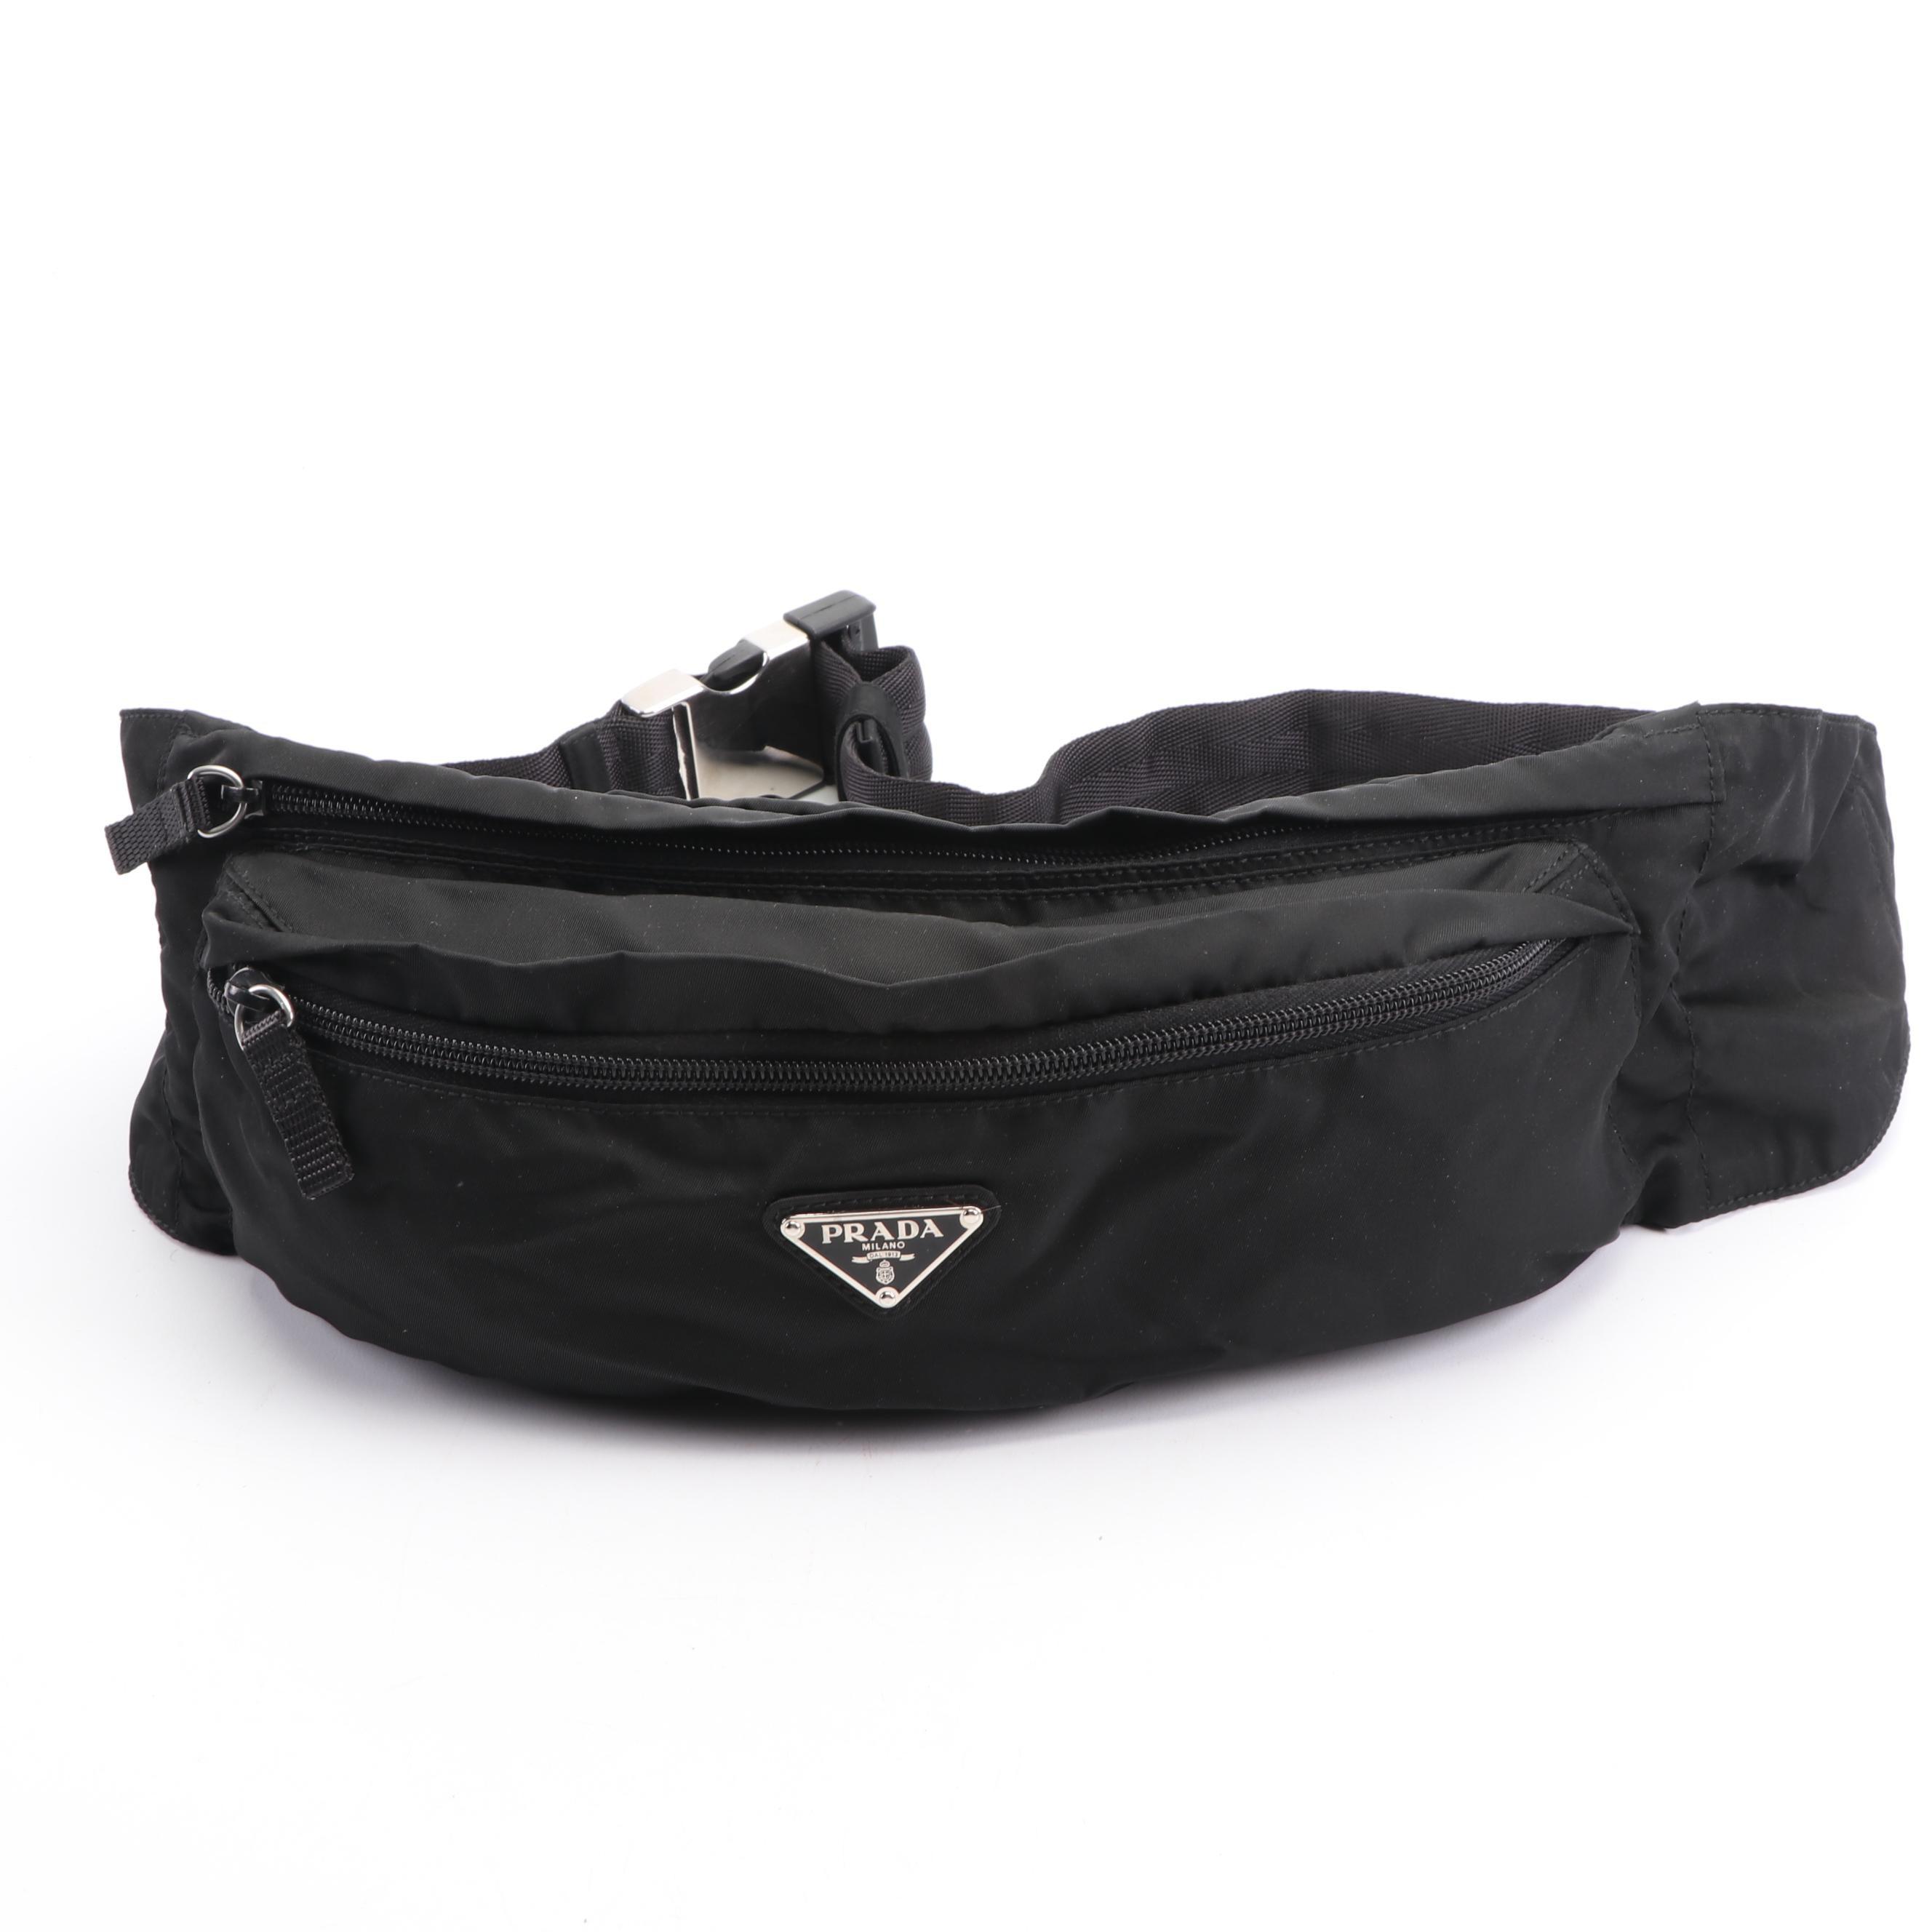 Prada Black Nylon Belt Bag